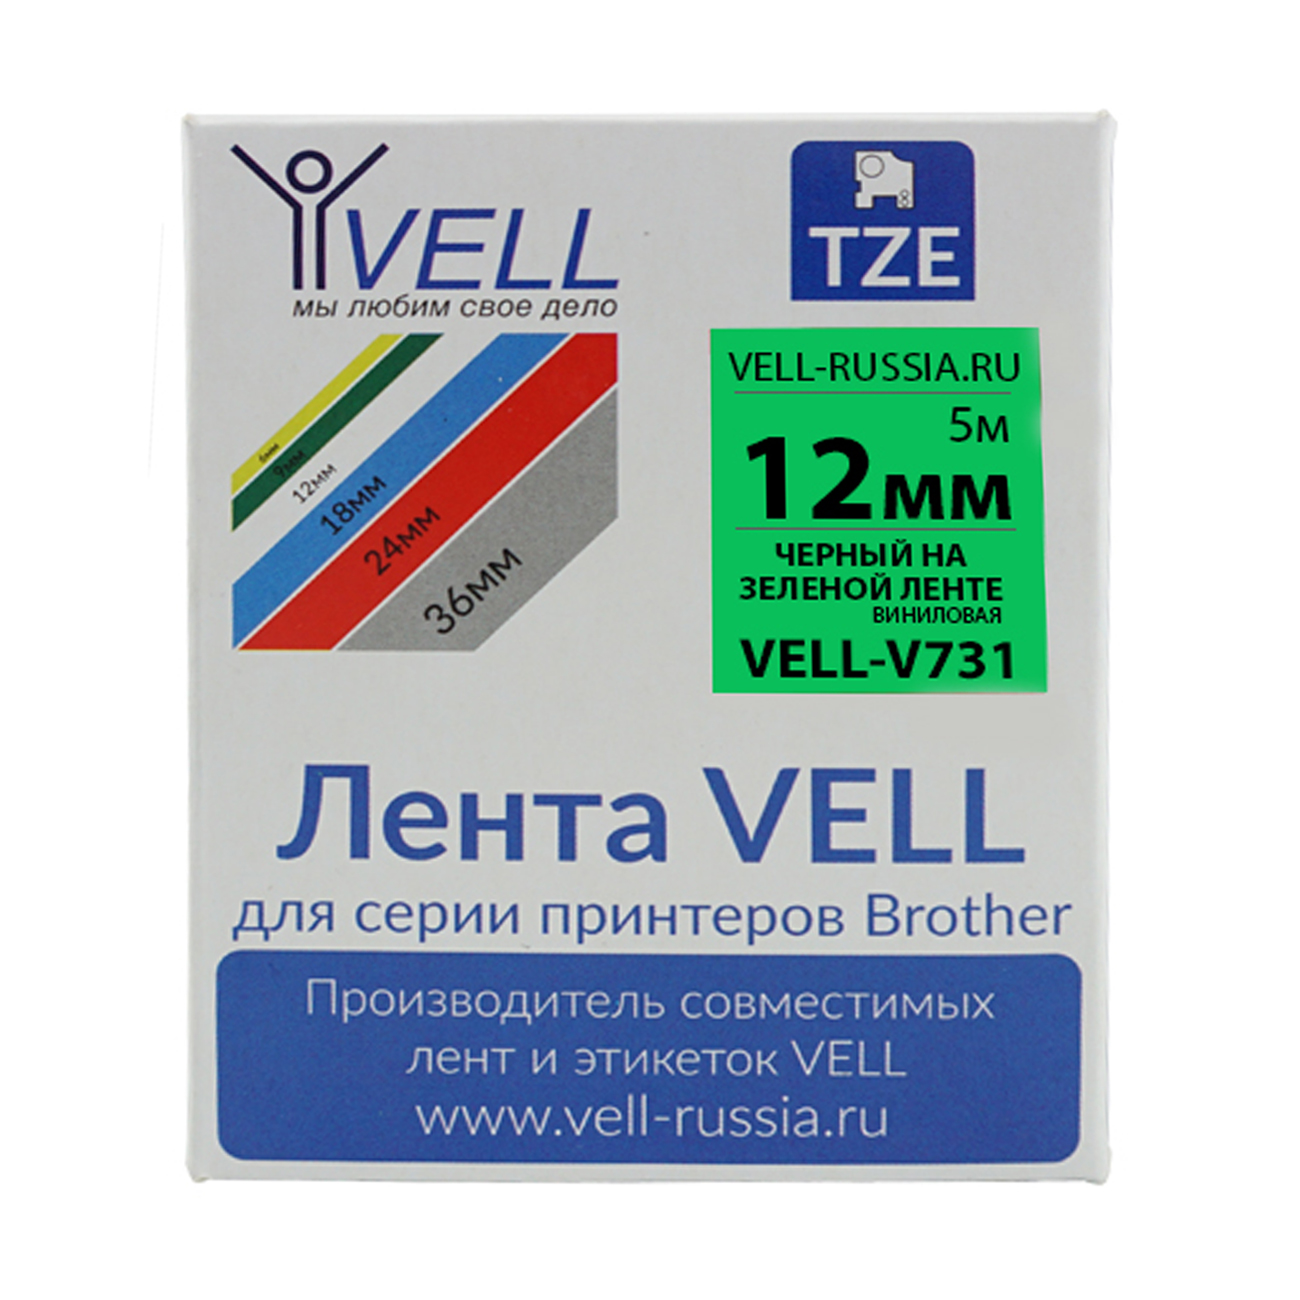 Фото Лента виниловая Vell V-731 (12 мм, черный на зеленом) для PT 1010/1280/D200/H105/E100/ D600/E300/2700/ P700/E550/9700 {Vell-V731}